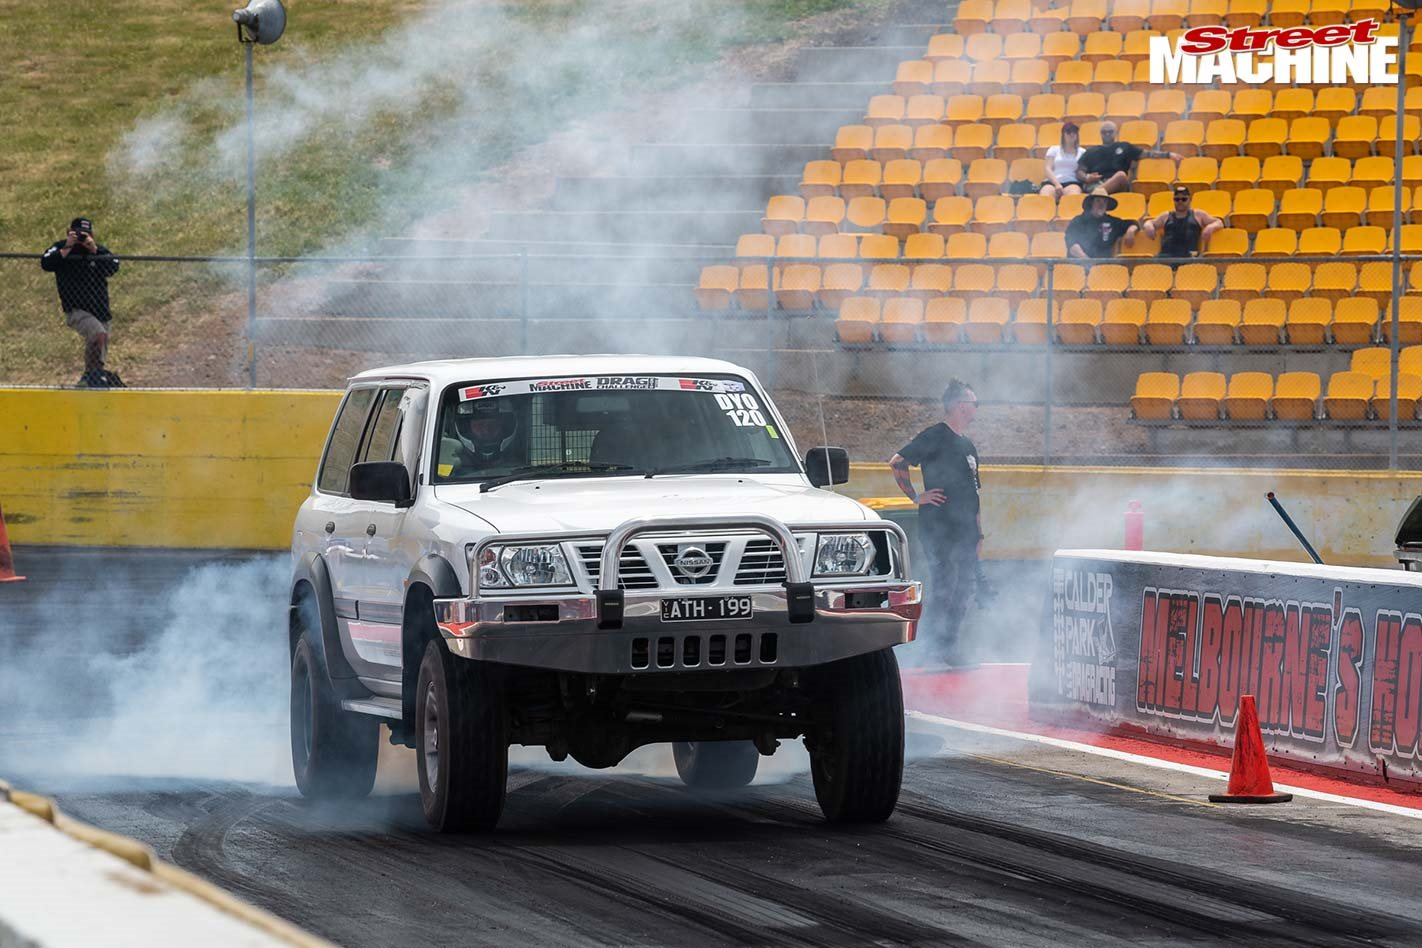 Geoff Stone's 2000 L98-powered Nissan Patrol at Drag Challenge 2019